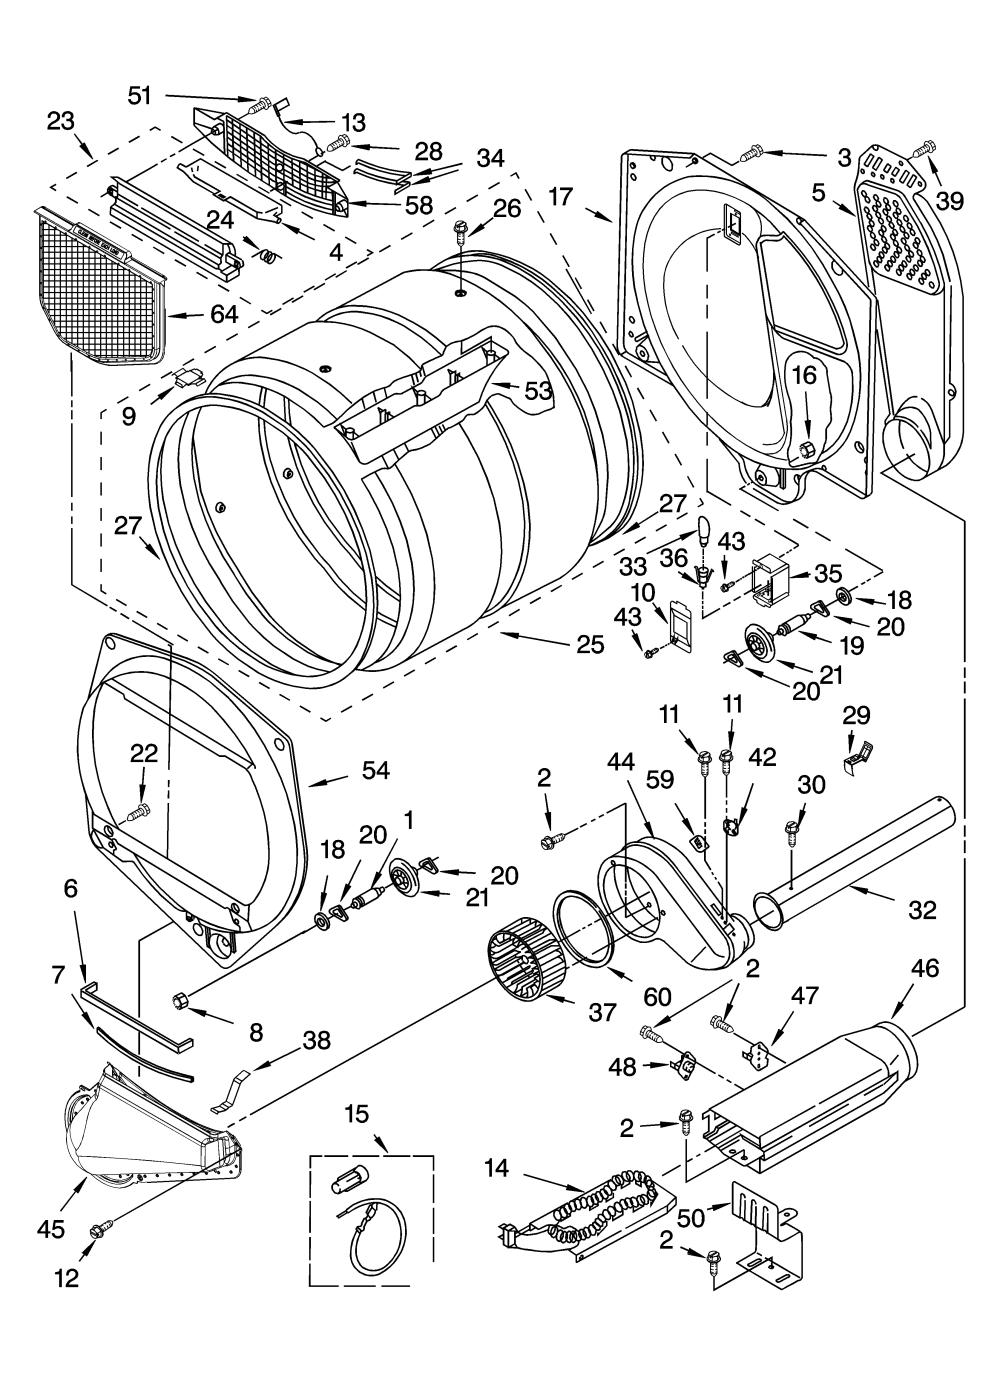 medium resolution of sear kenmore dryer wiring diagram